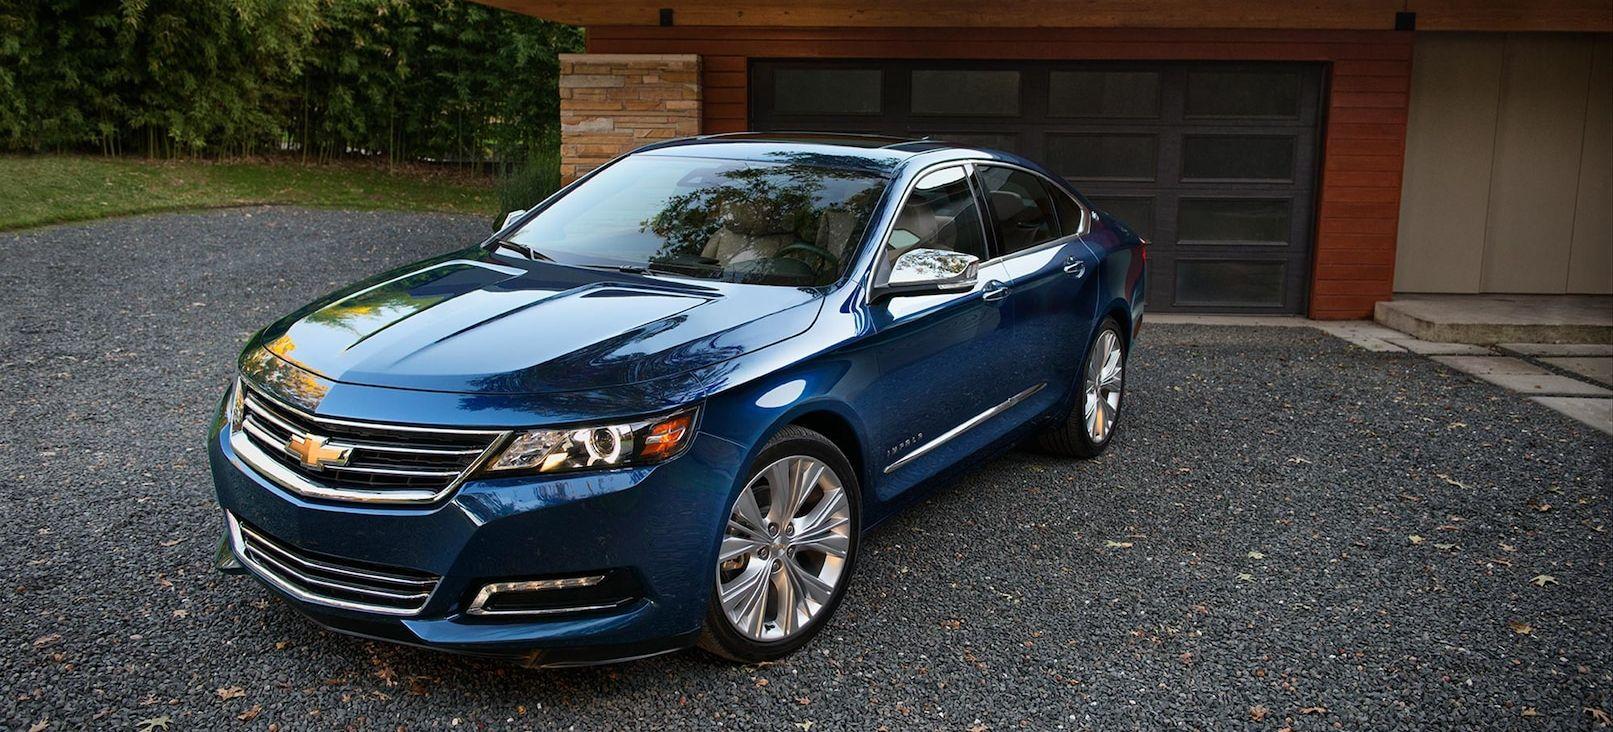 2018 Chevrolet Impala Leasing near Manassas, VA